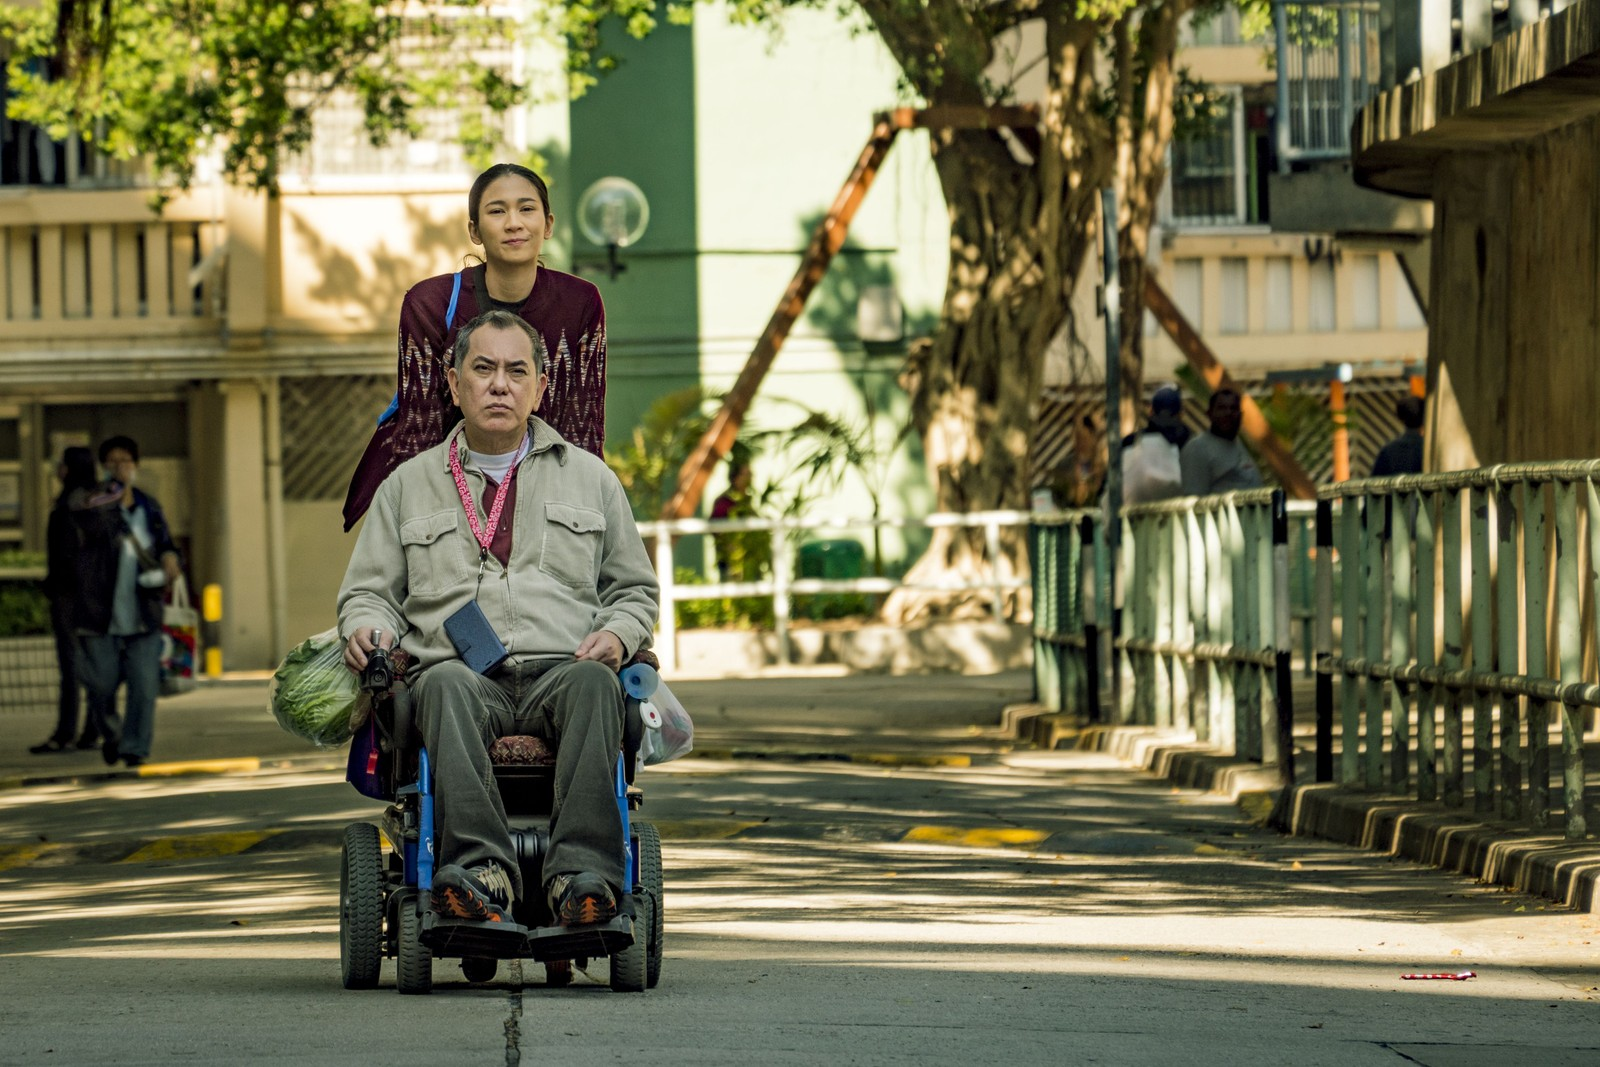 HYPEBEAST 專訪黃秋生:為何會覺得香港電影題材很狹窄?因為以前的人沒有幻想力。